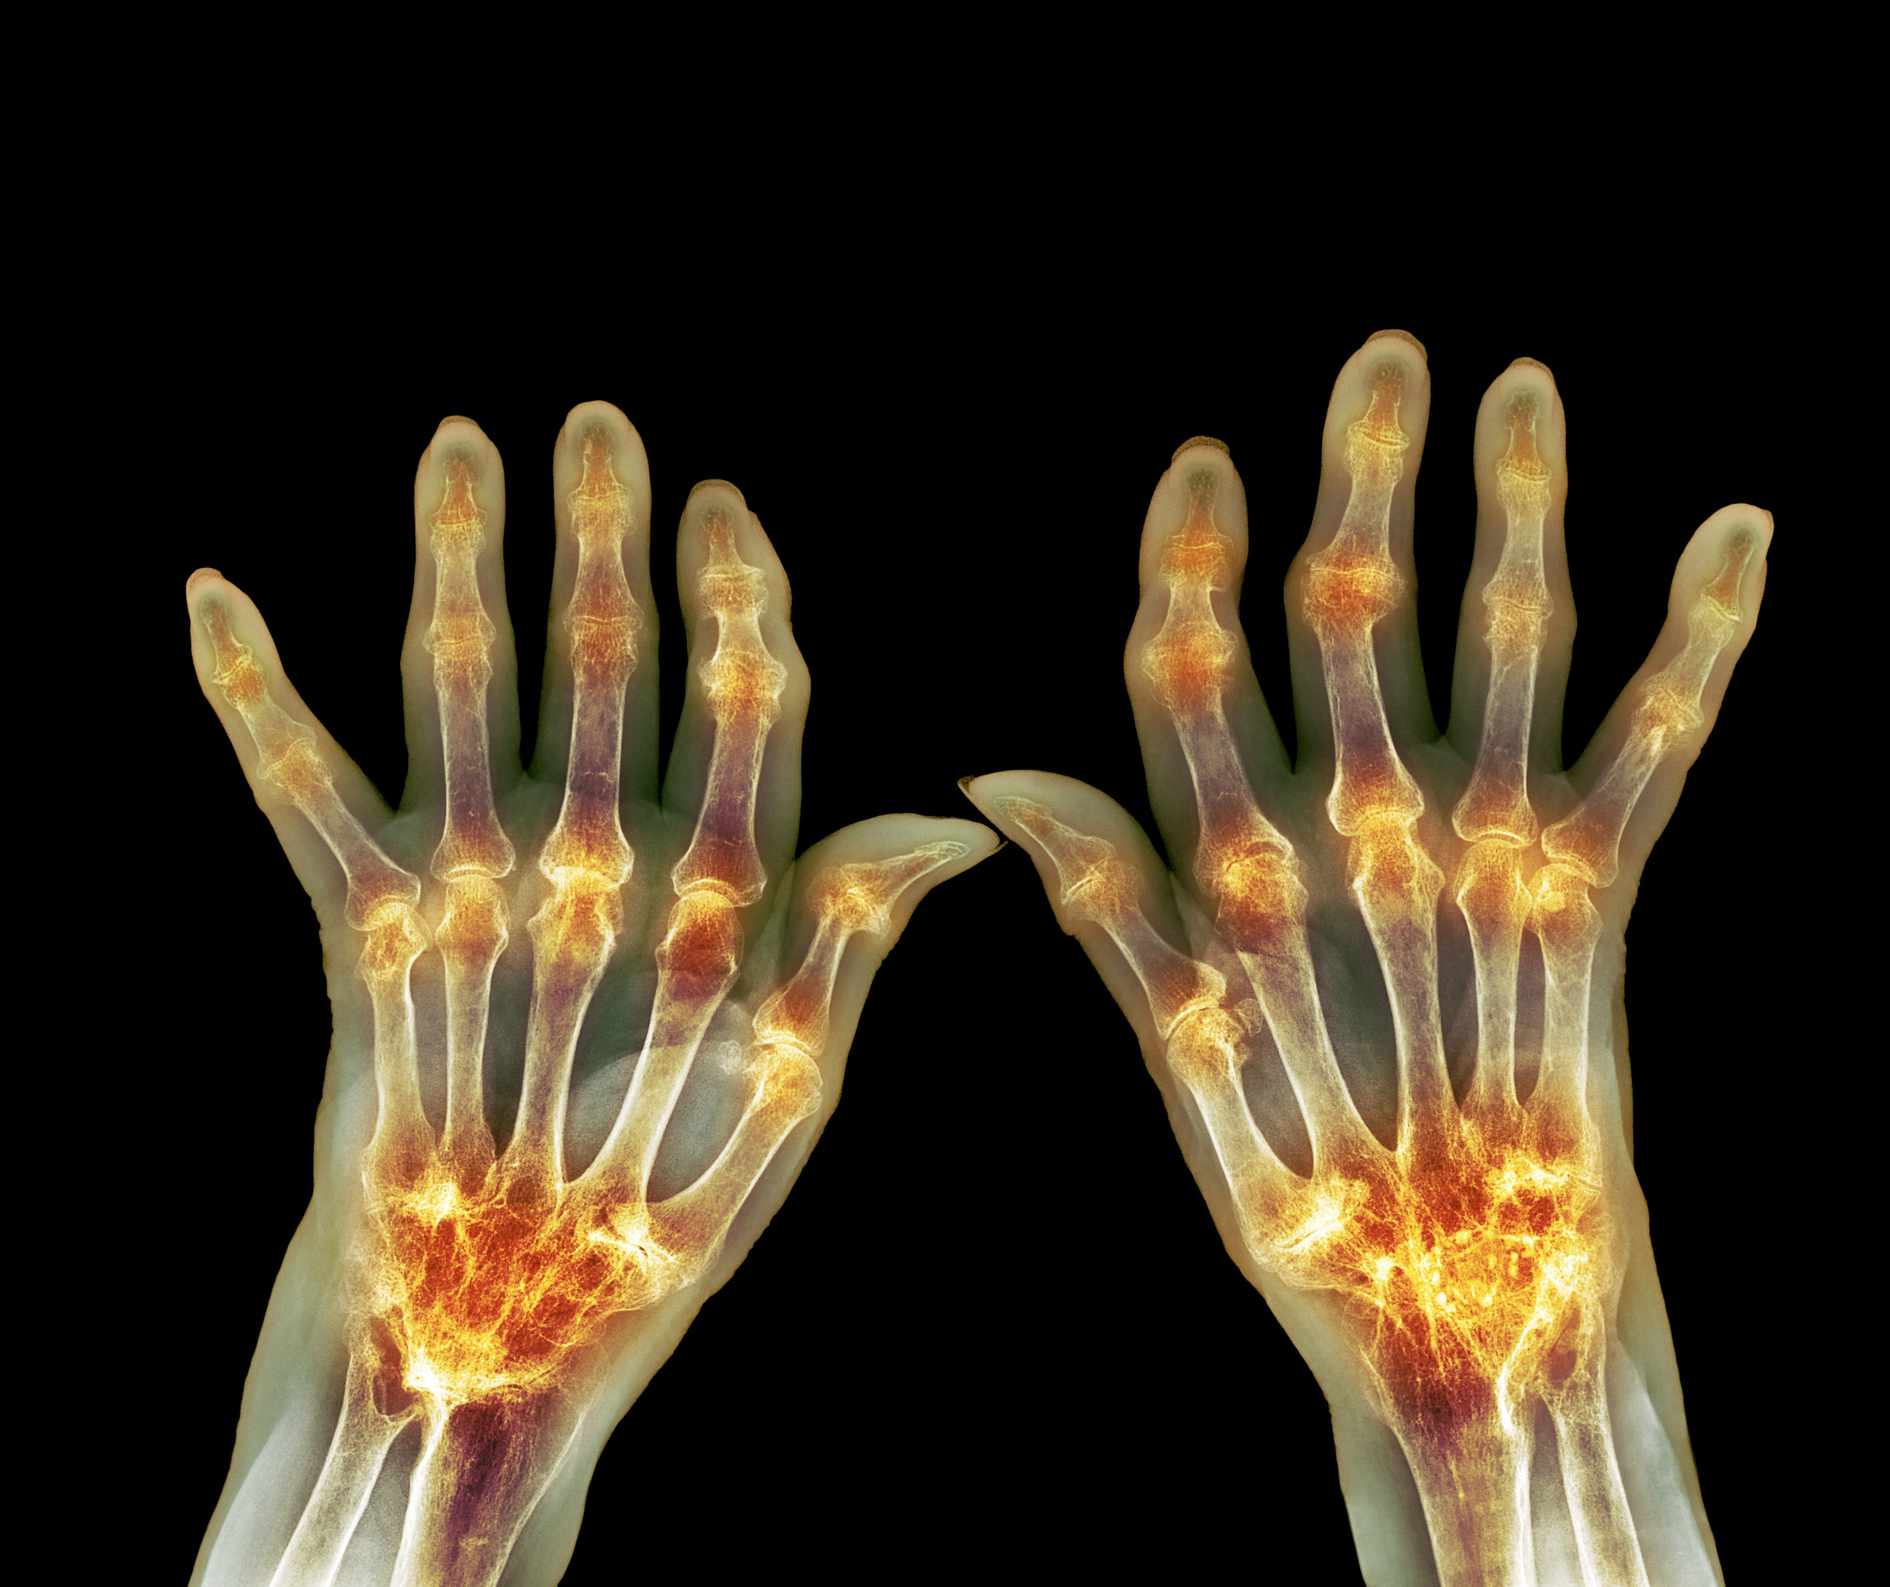 Rheumatoid arthritis, X-ray of hands